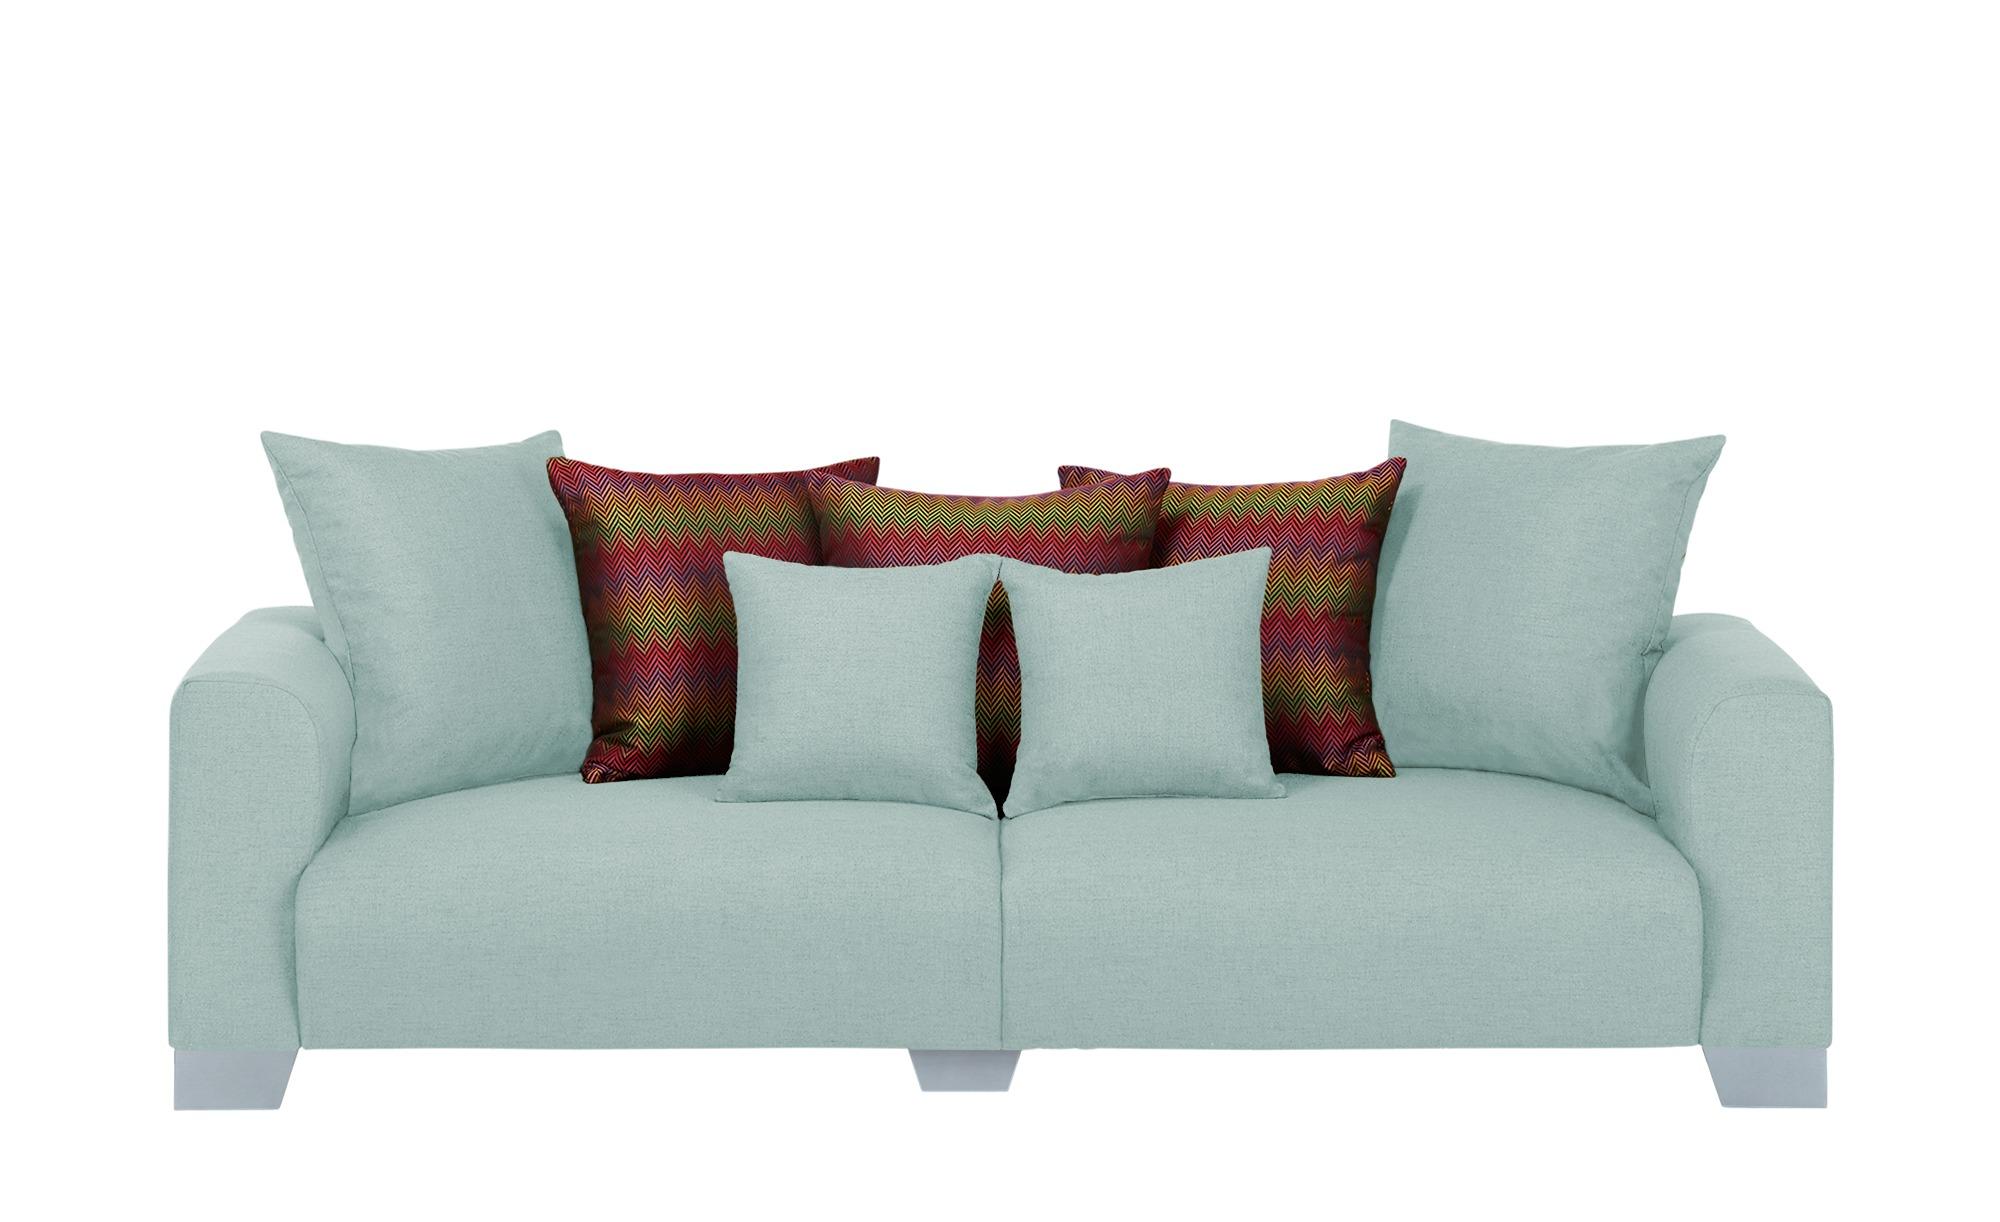 smart Big Sofa  Tonja ¦ blau ¦ Maße (cm): B: 244 H: 68 T: 107 Polstermöbel > Sofas > Big-Sofas - Höffner